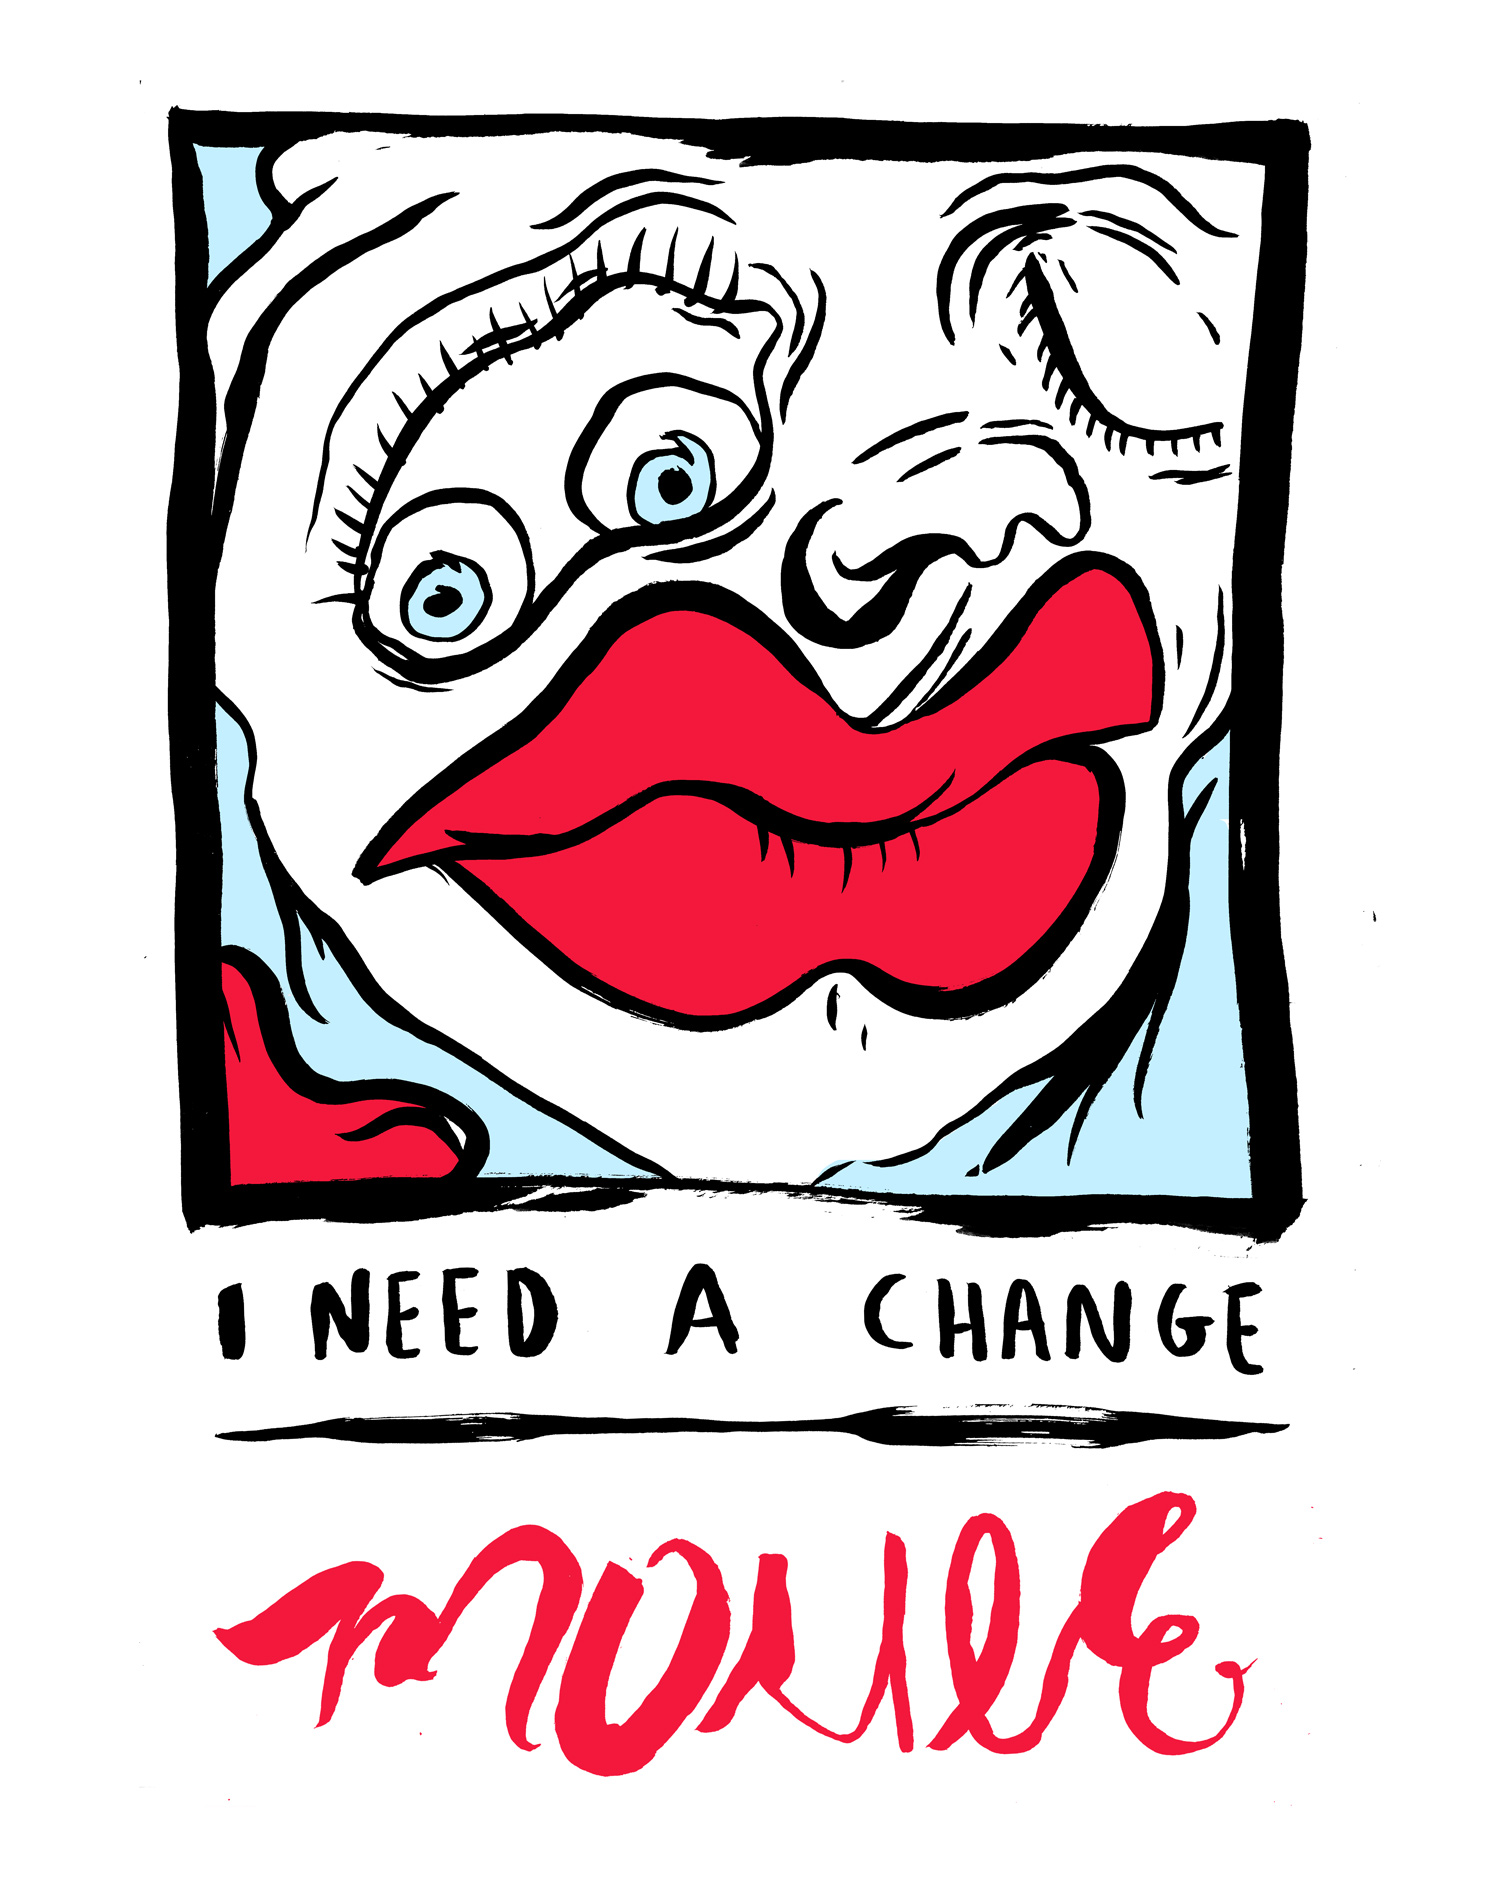 I need a change